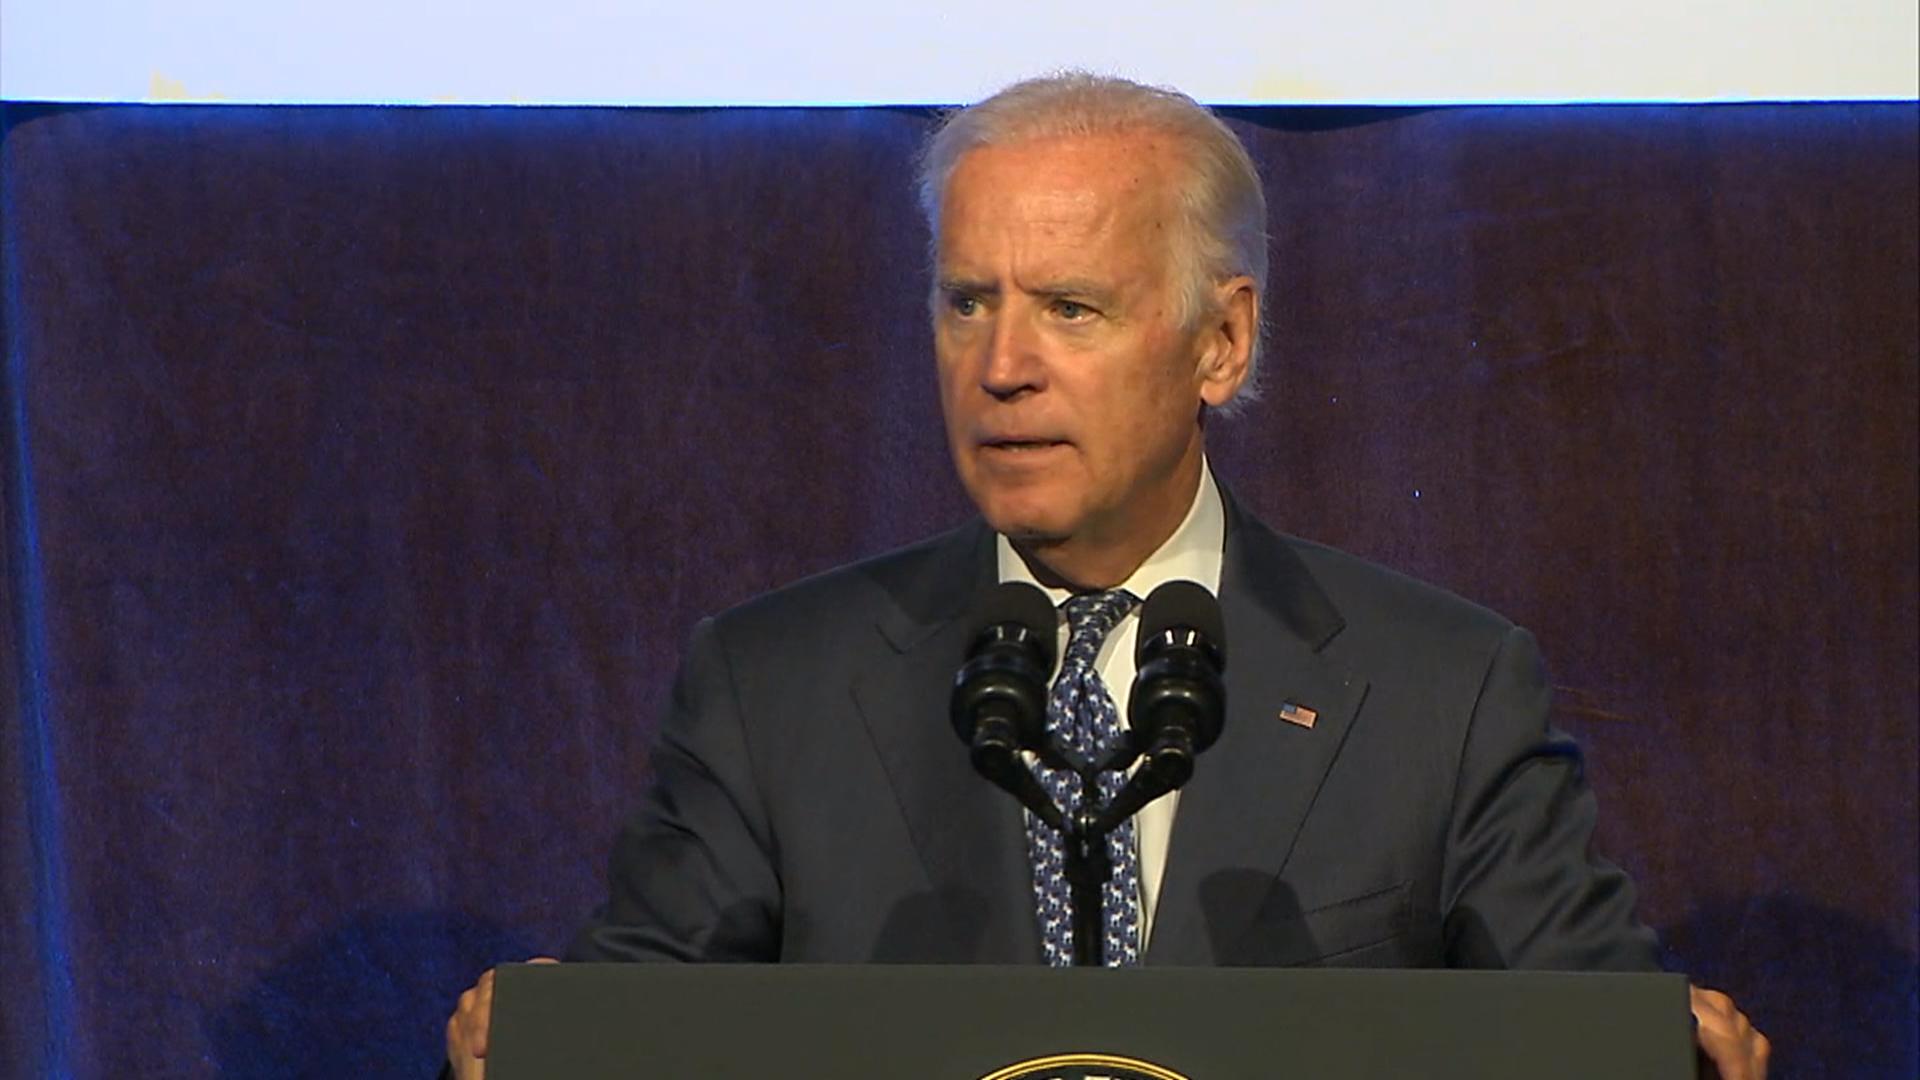 Joe Biden Considering Presidential Run, New York Times Reports